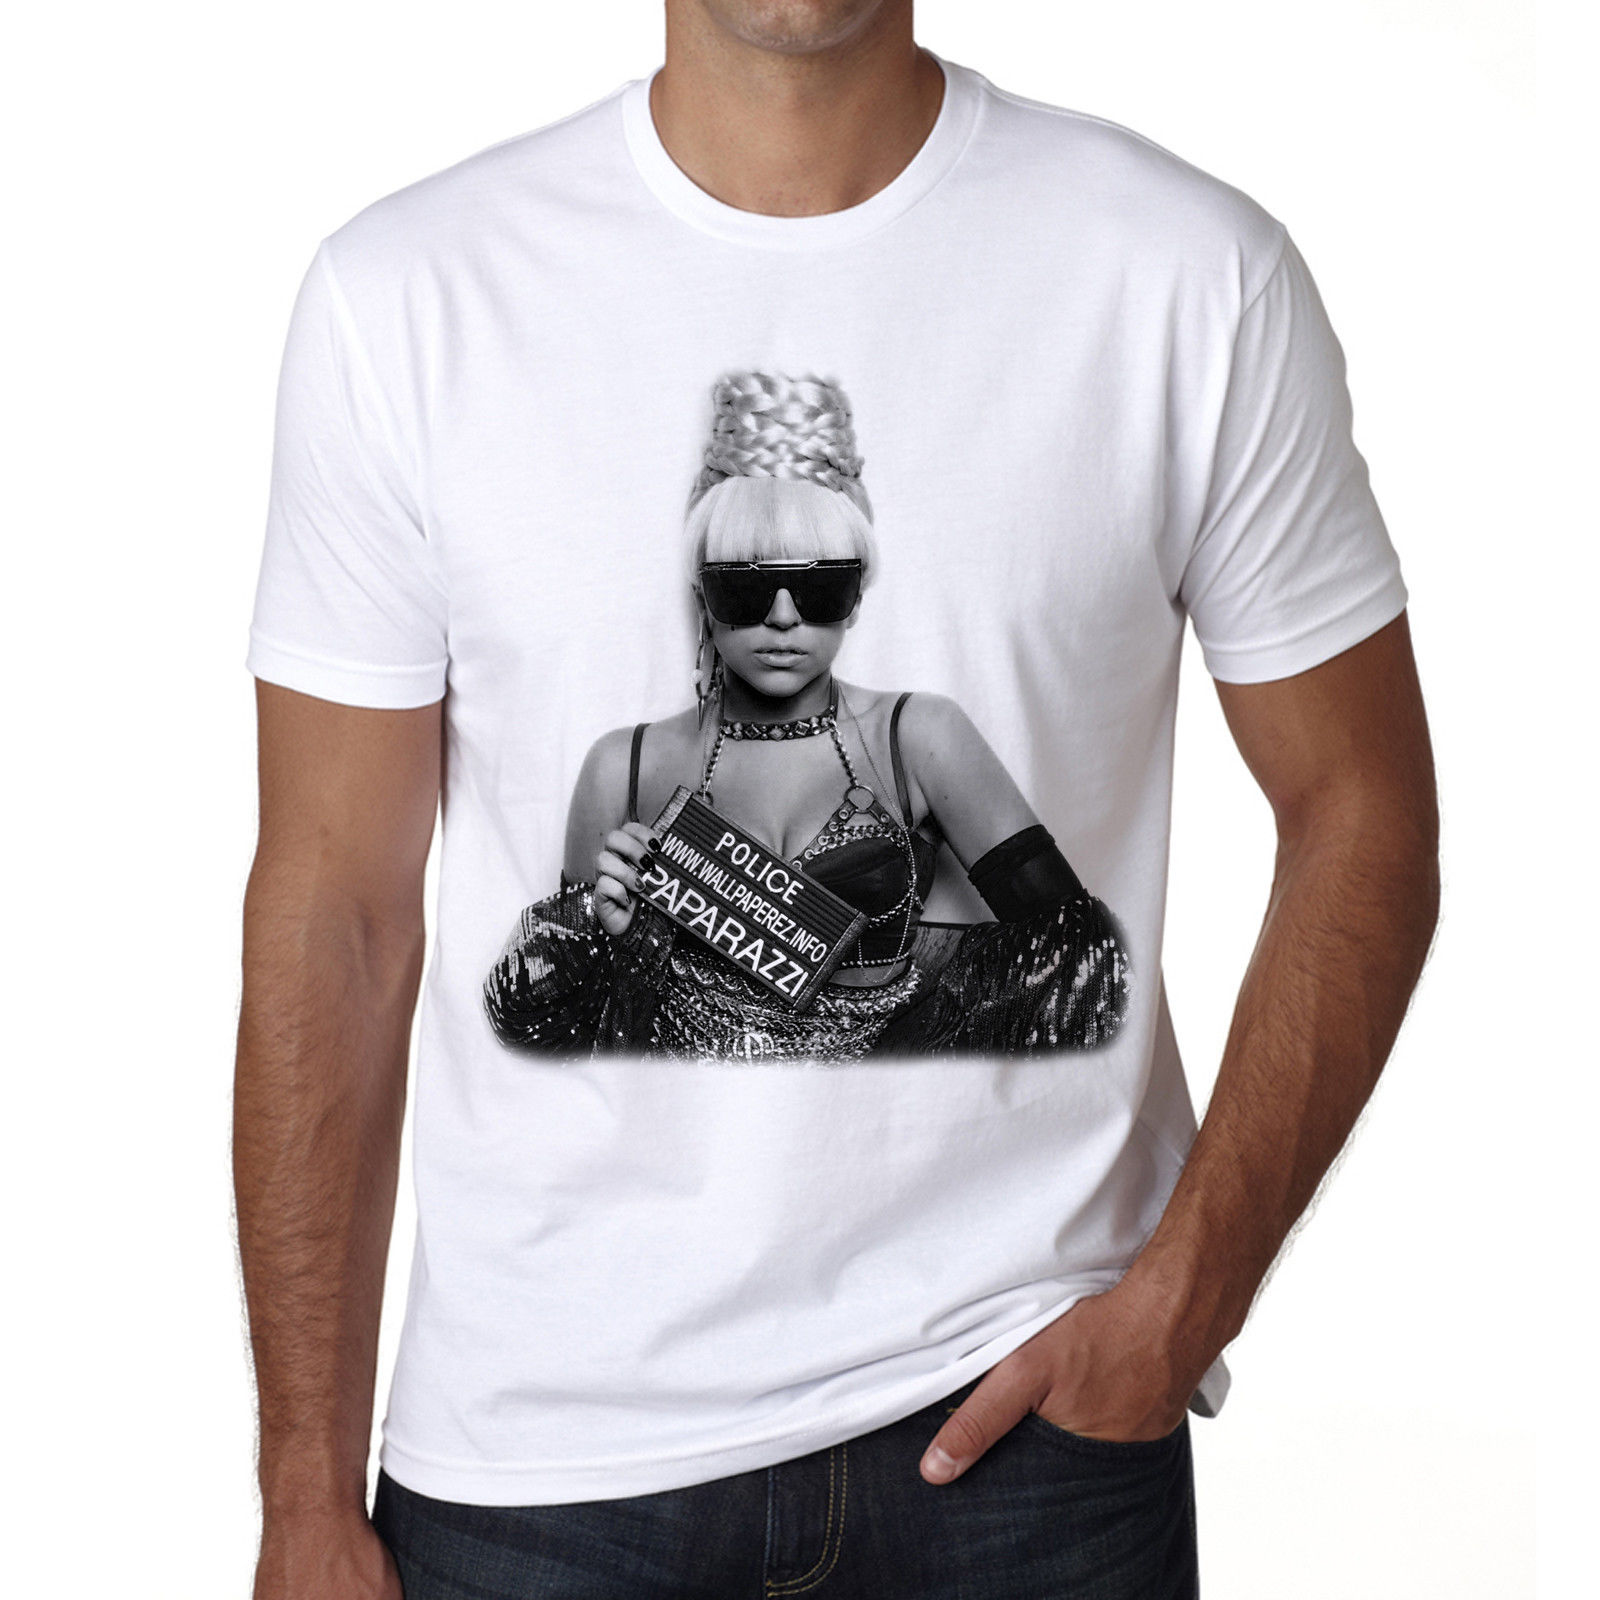 Lady Gaga , celebrite, star, t-shirt coton blanc, cadeau ideal